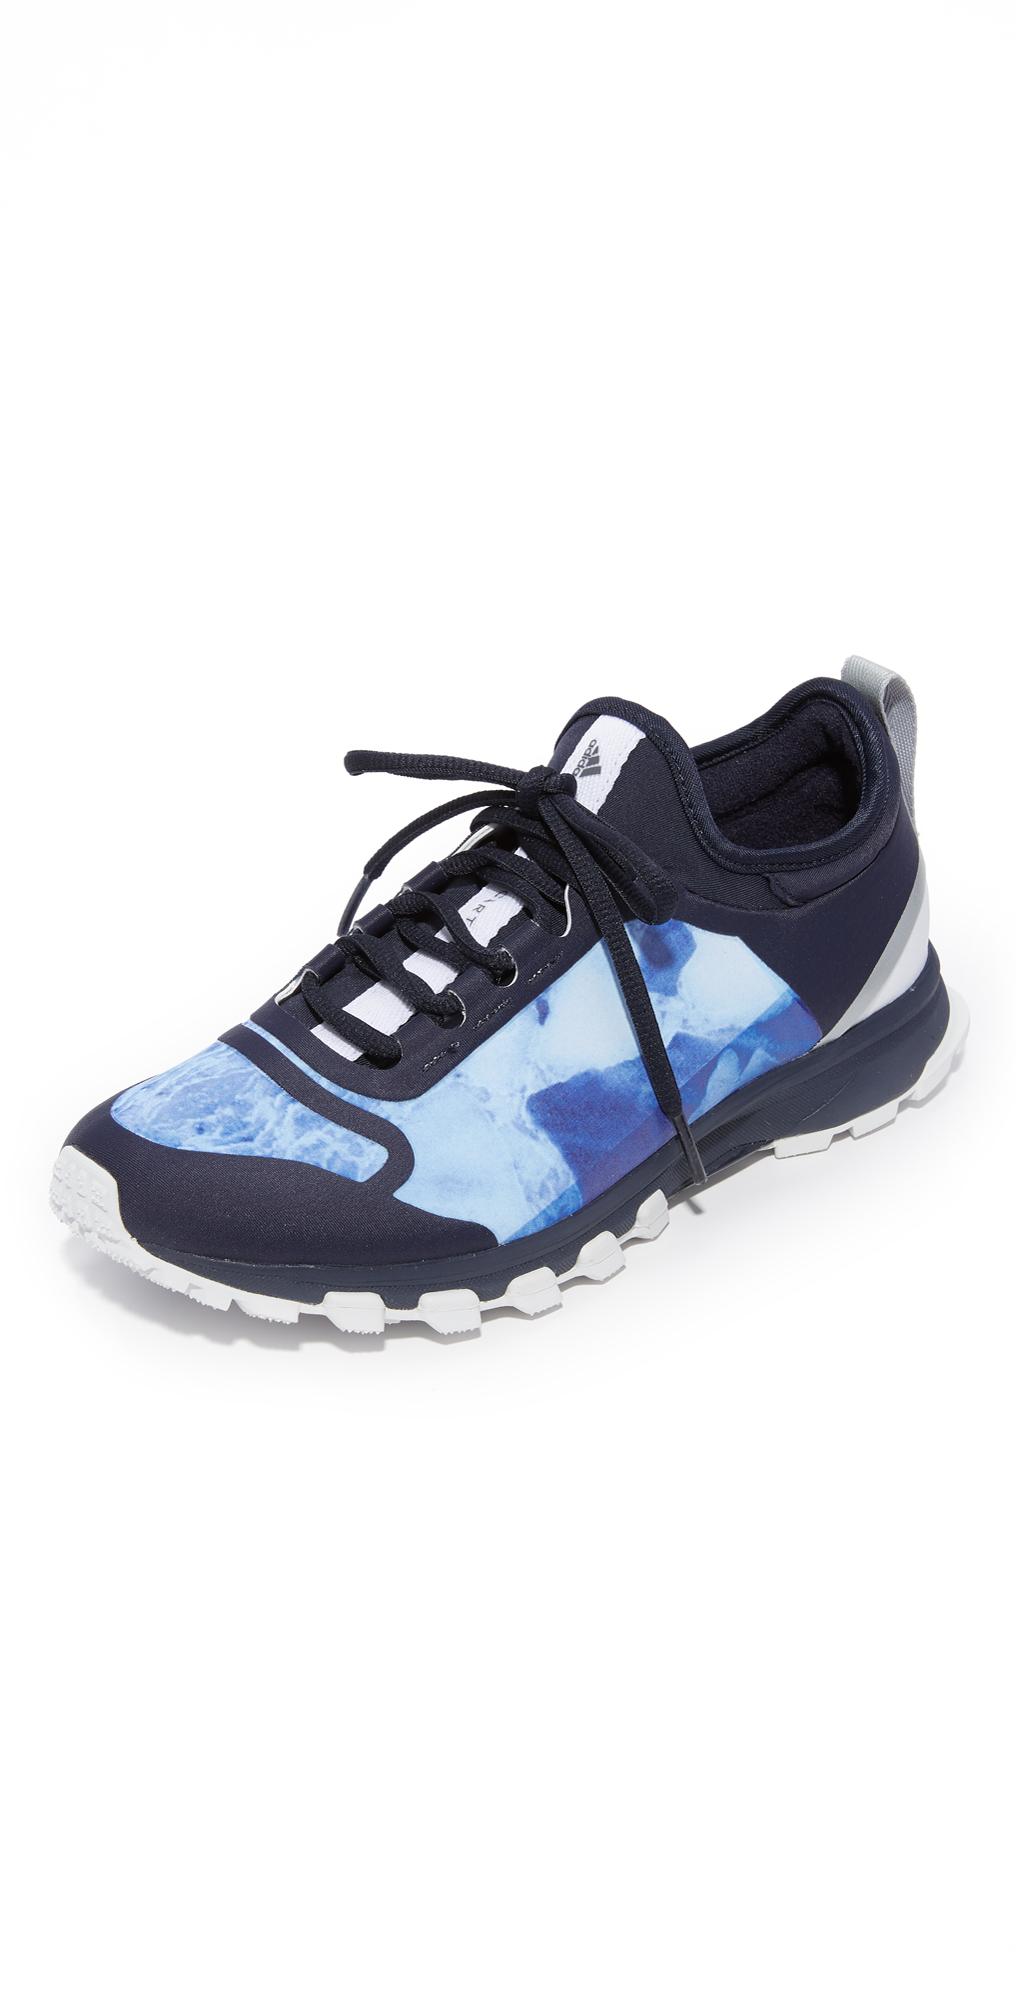 Adizero XT Printed Sneakers adidas by Stella McCartney